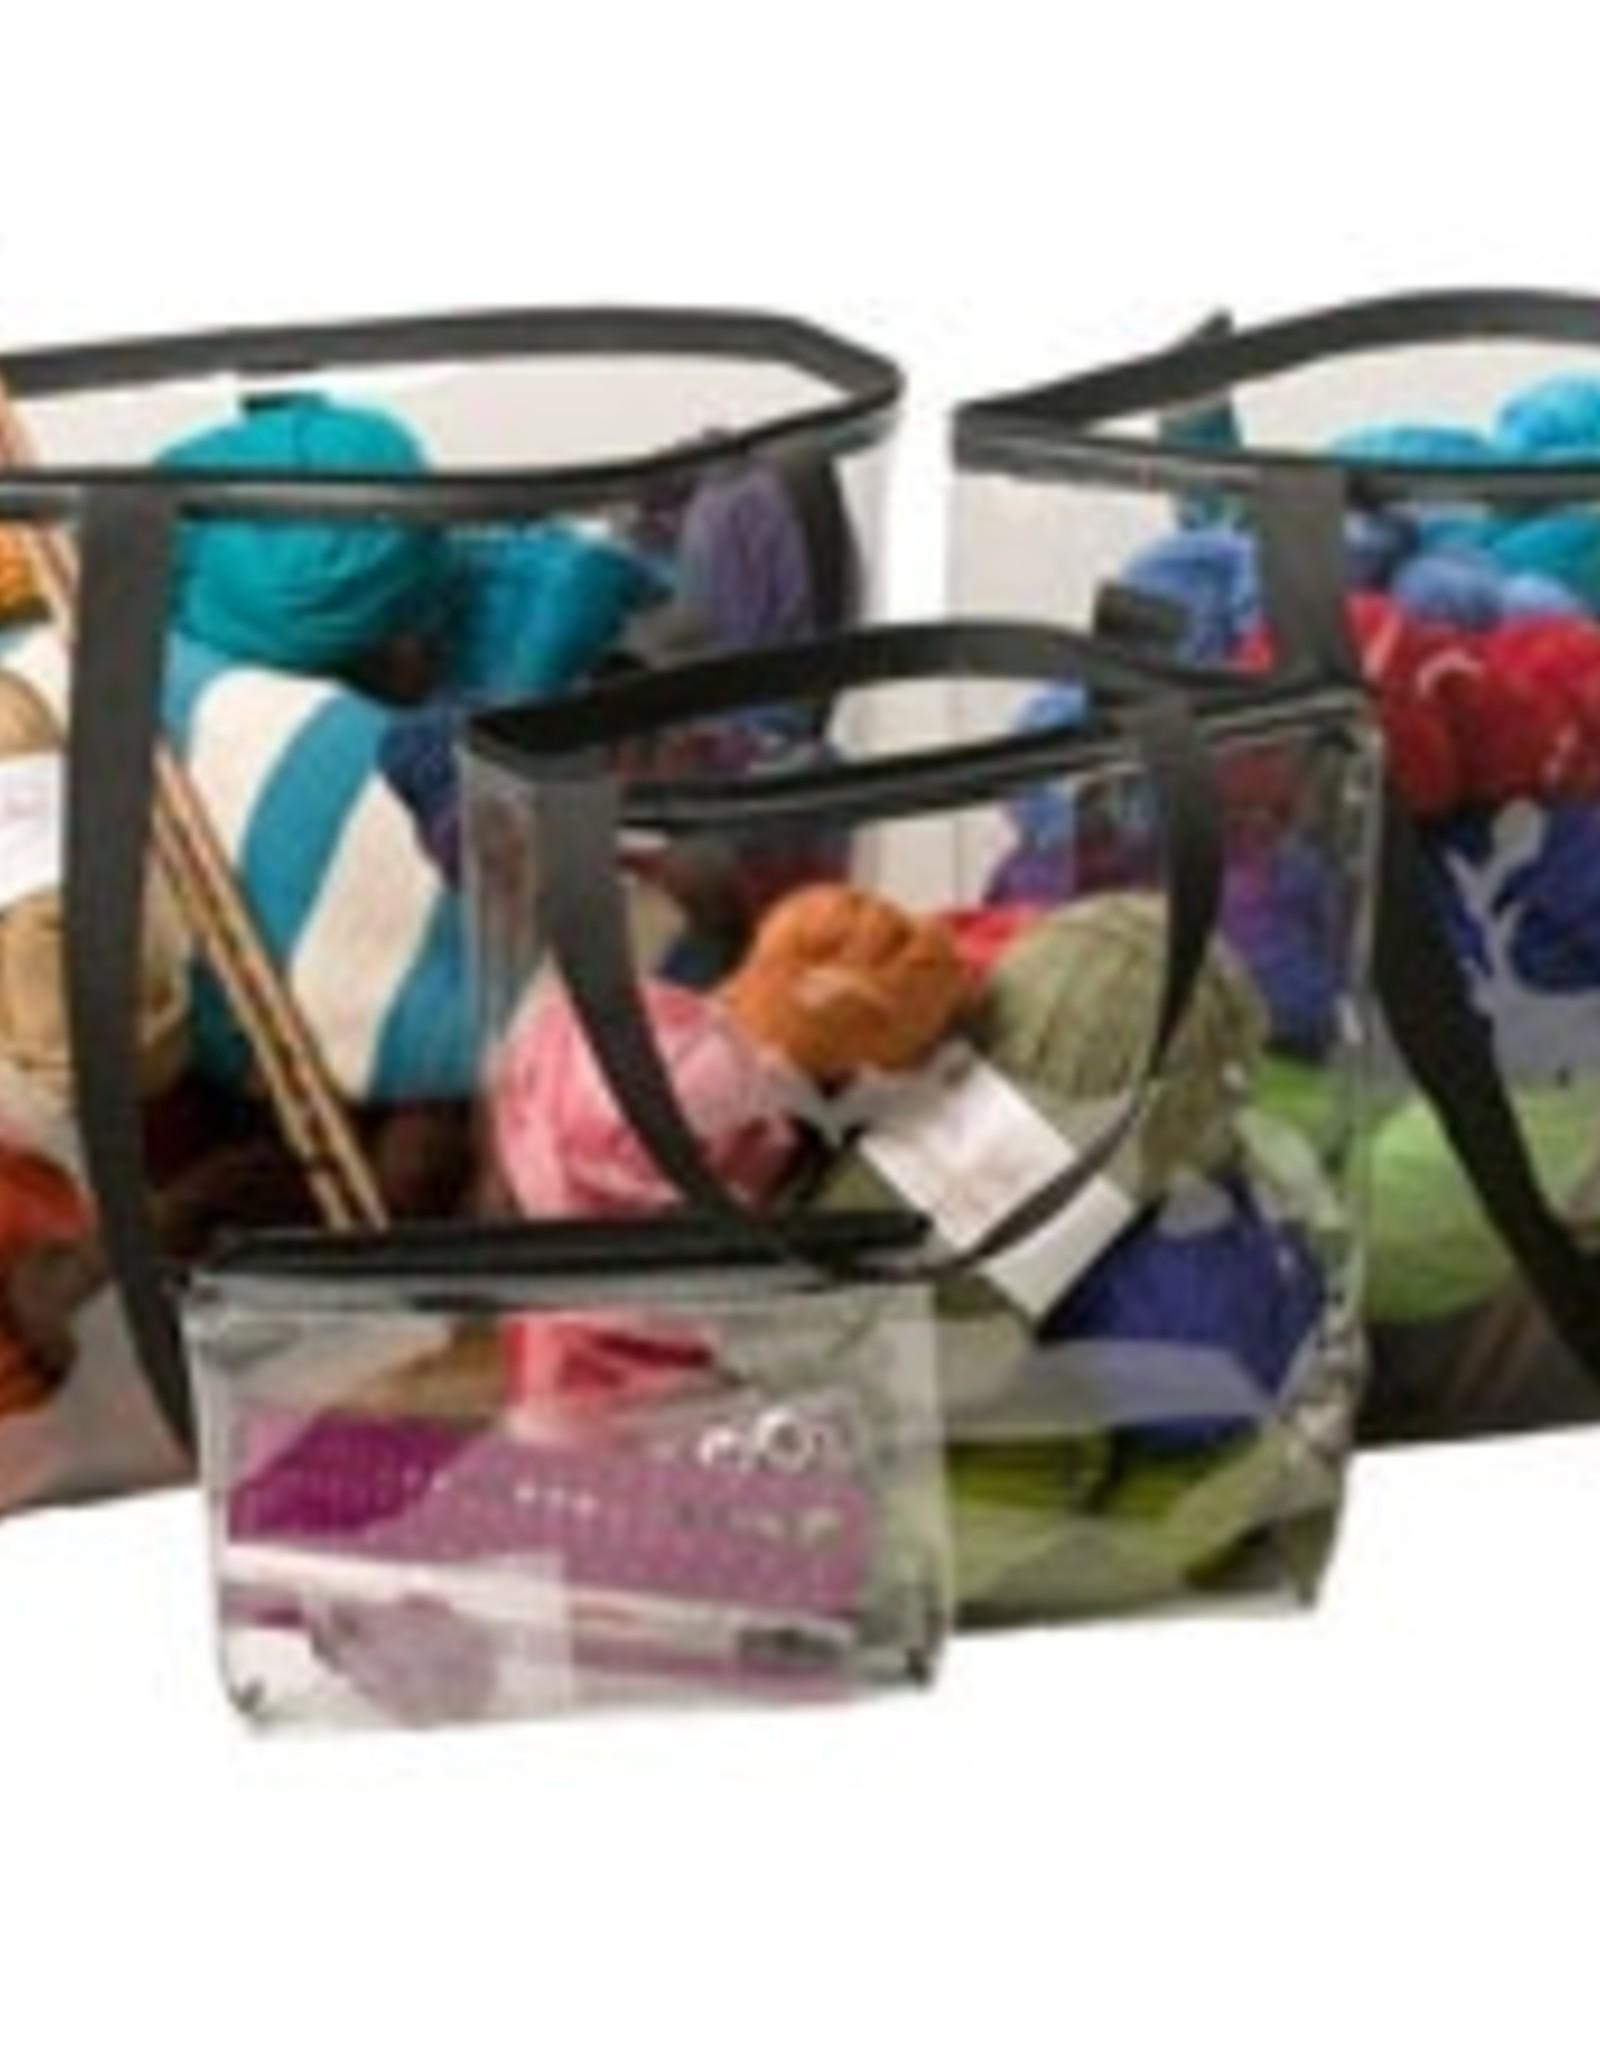 Knitpicks Zippered Project Bag, Large